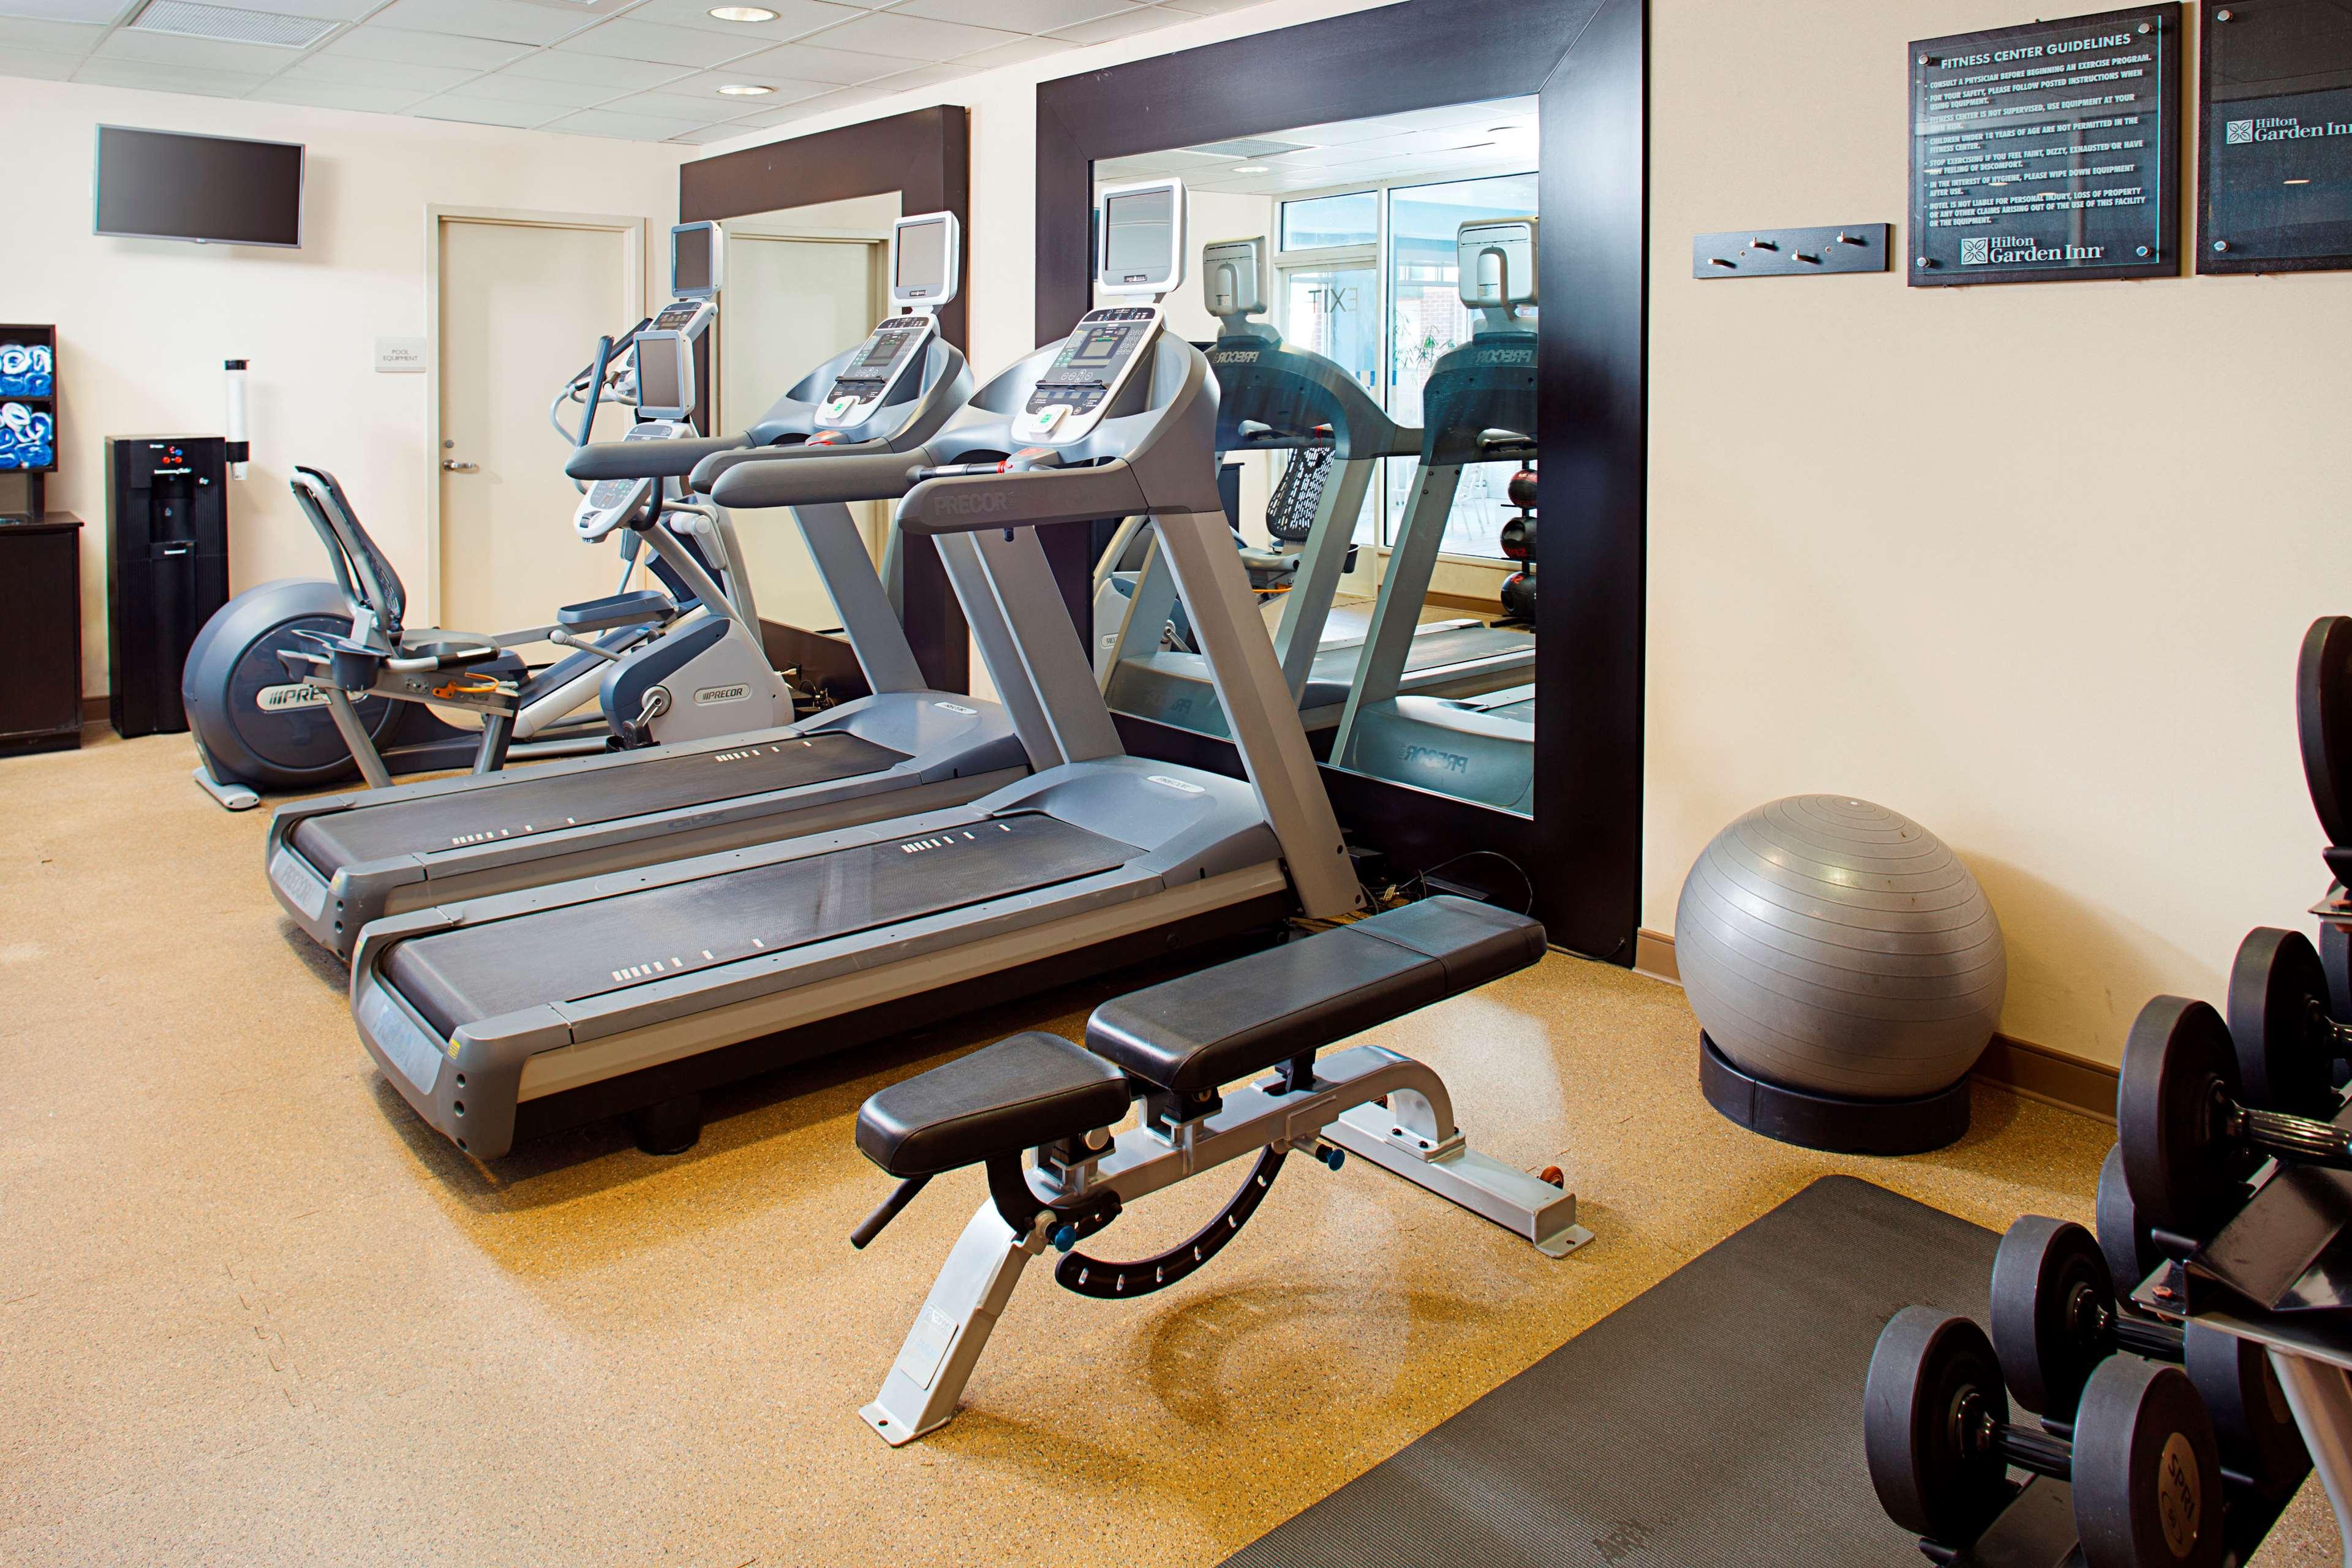 Hilton Garden Inn Hartford North/Bradley Intu0027l Airport 555 Corporate Drive  Windsor, CT Hotels U0026 Motels   MapQuest